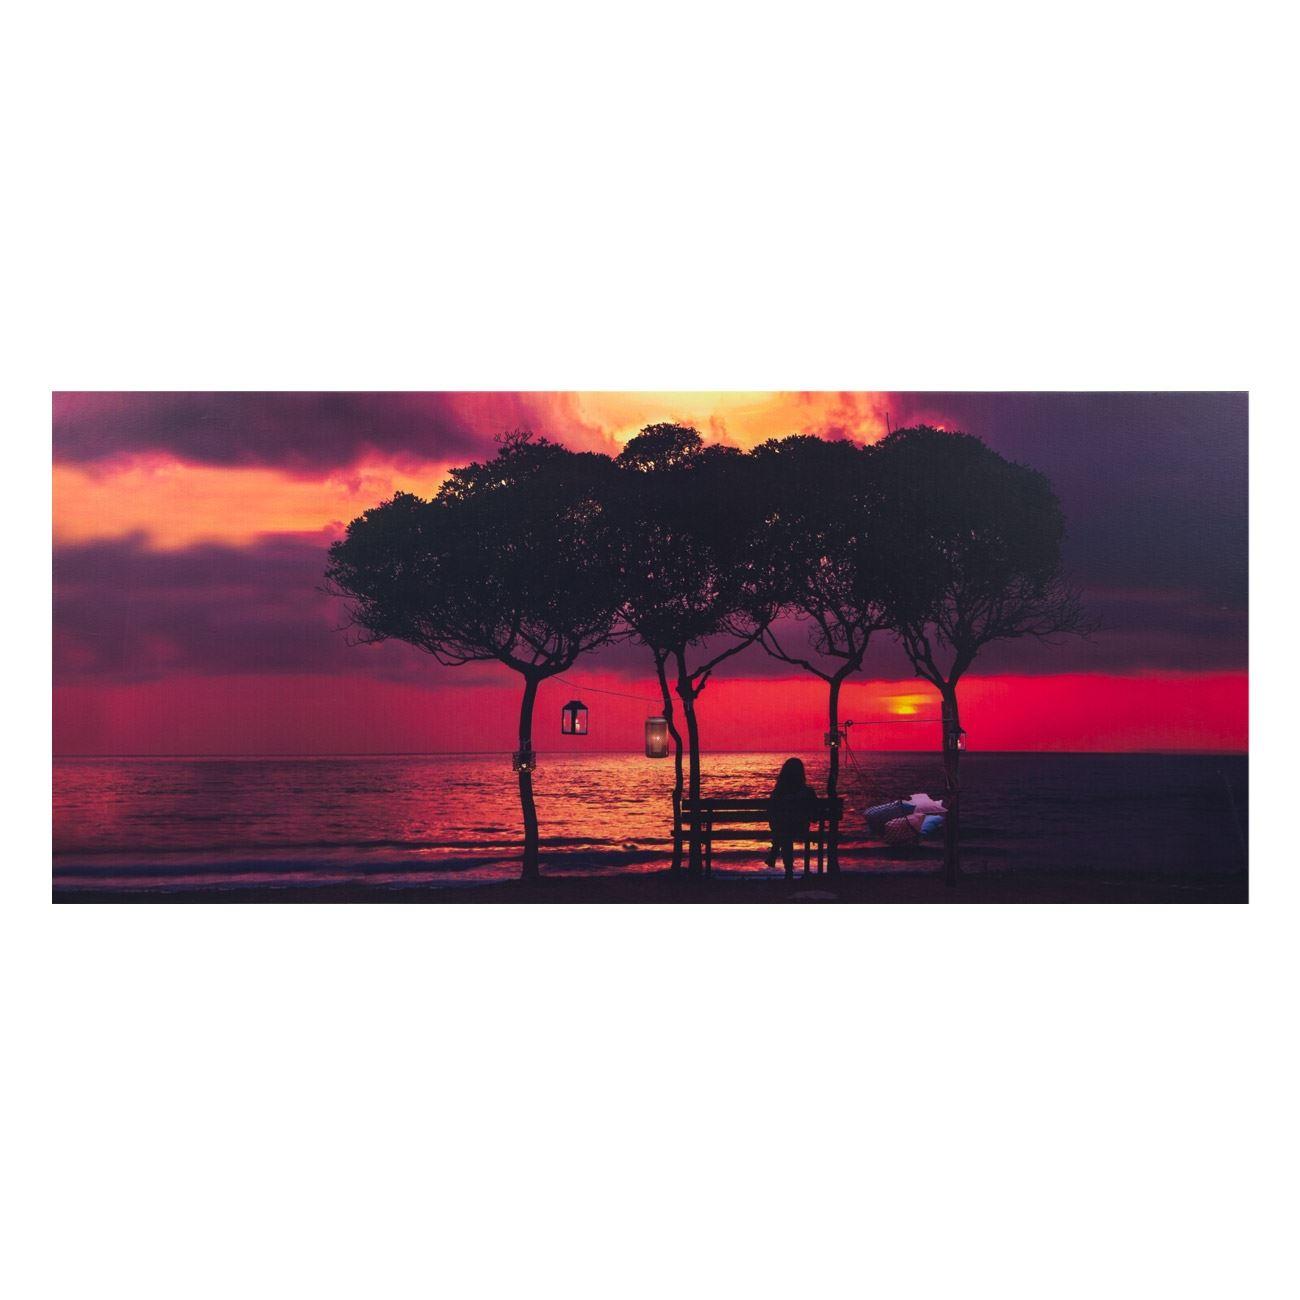 1a51ea23fa4 Καμβάς Φωτιζόμενος Led Ηλιοβασίλεμα Δέντρα 70x30x1.5 cm